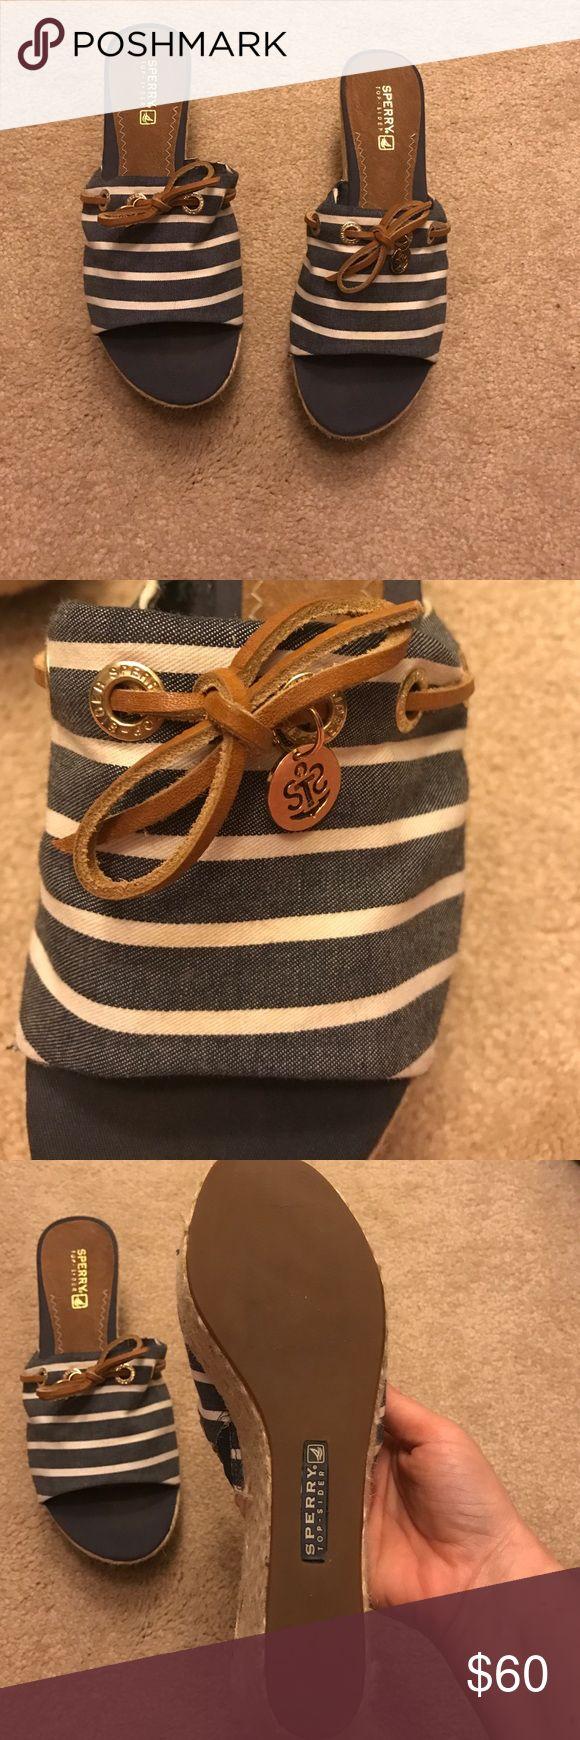 Never Worn Sperry Sandals Cute, nautical Sperry slide sandals- Never worn! Sperry Top-Sider Shoes Sandals